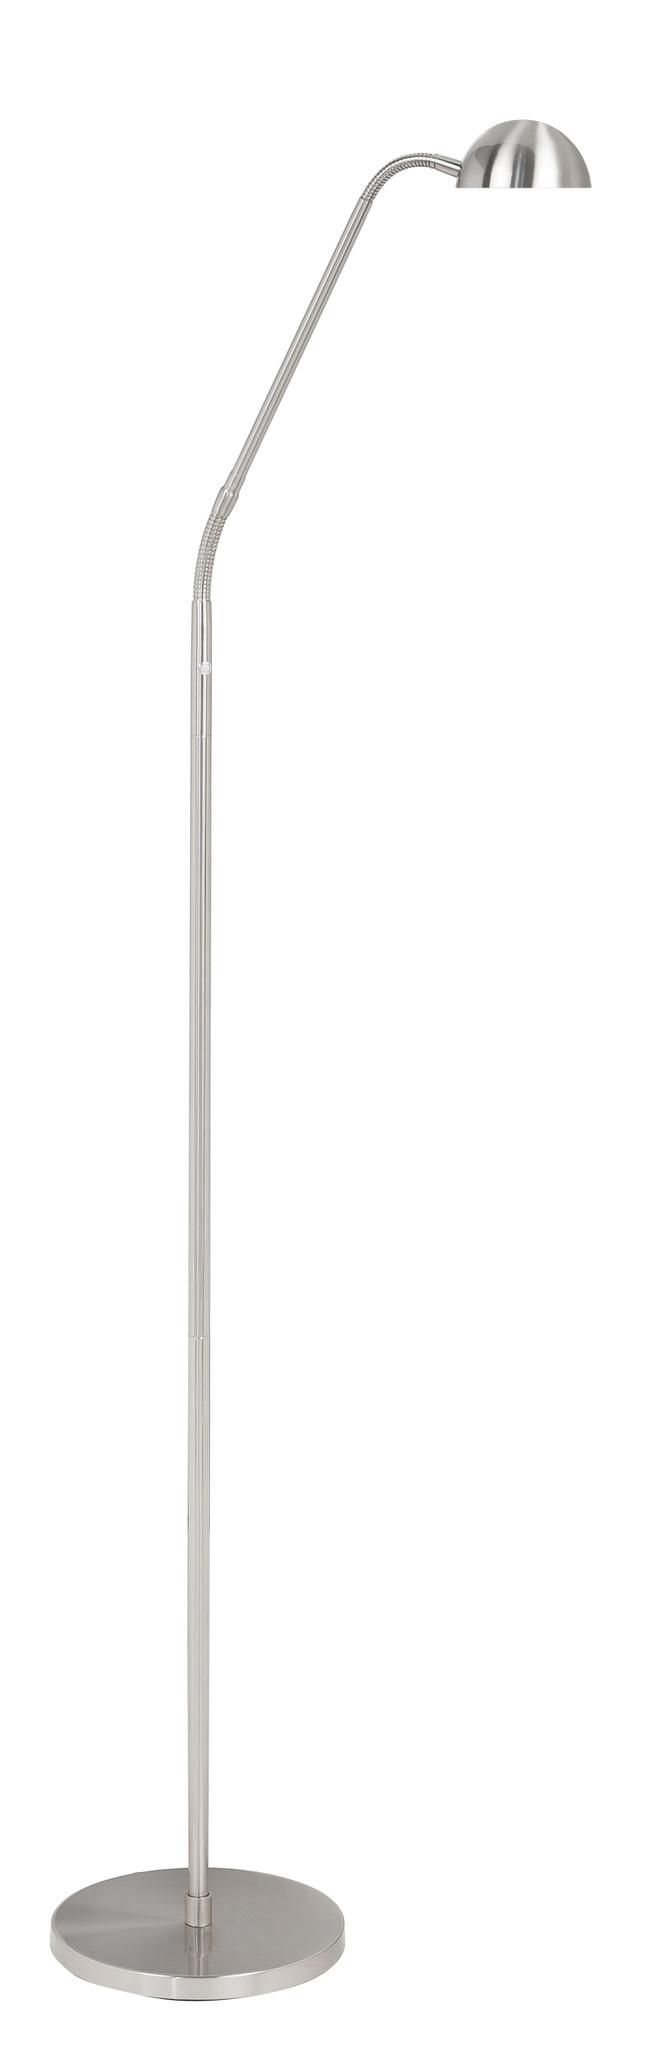 Vloerlamp Parma RVS Led incl. Dimmer